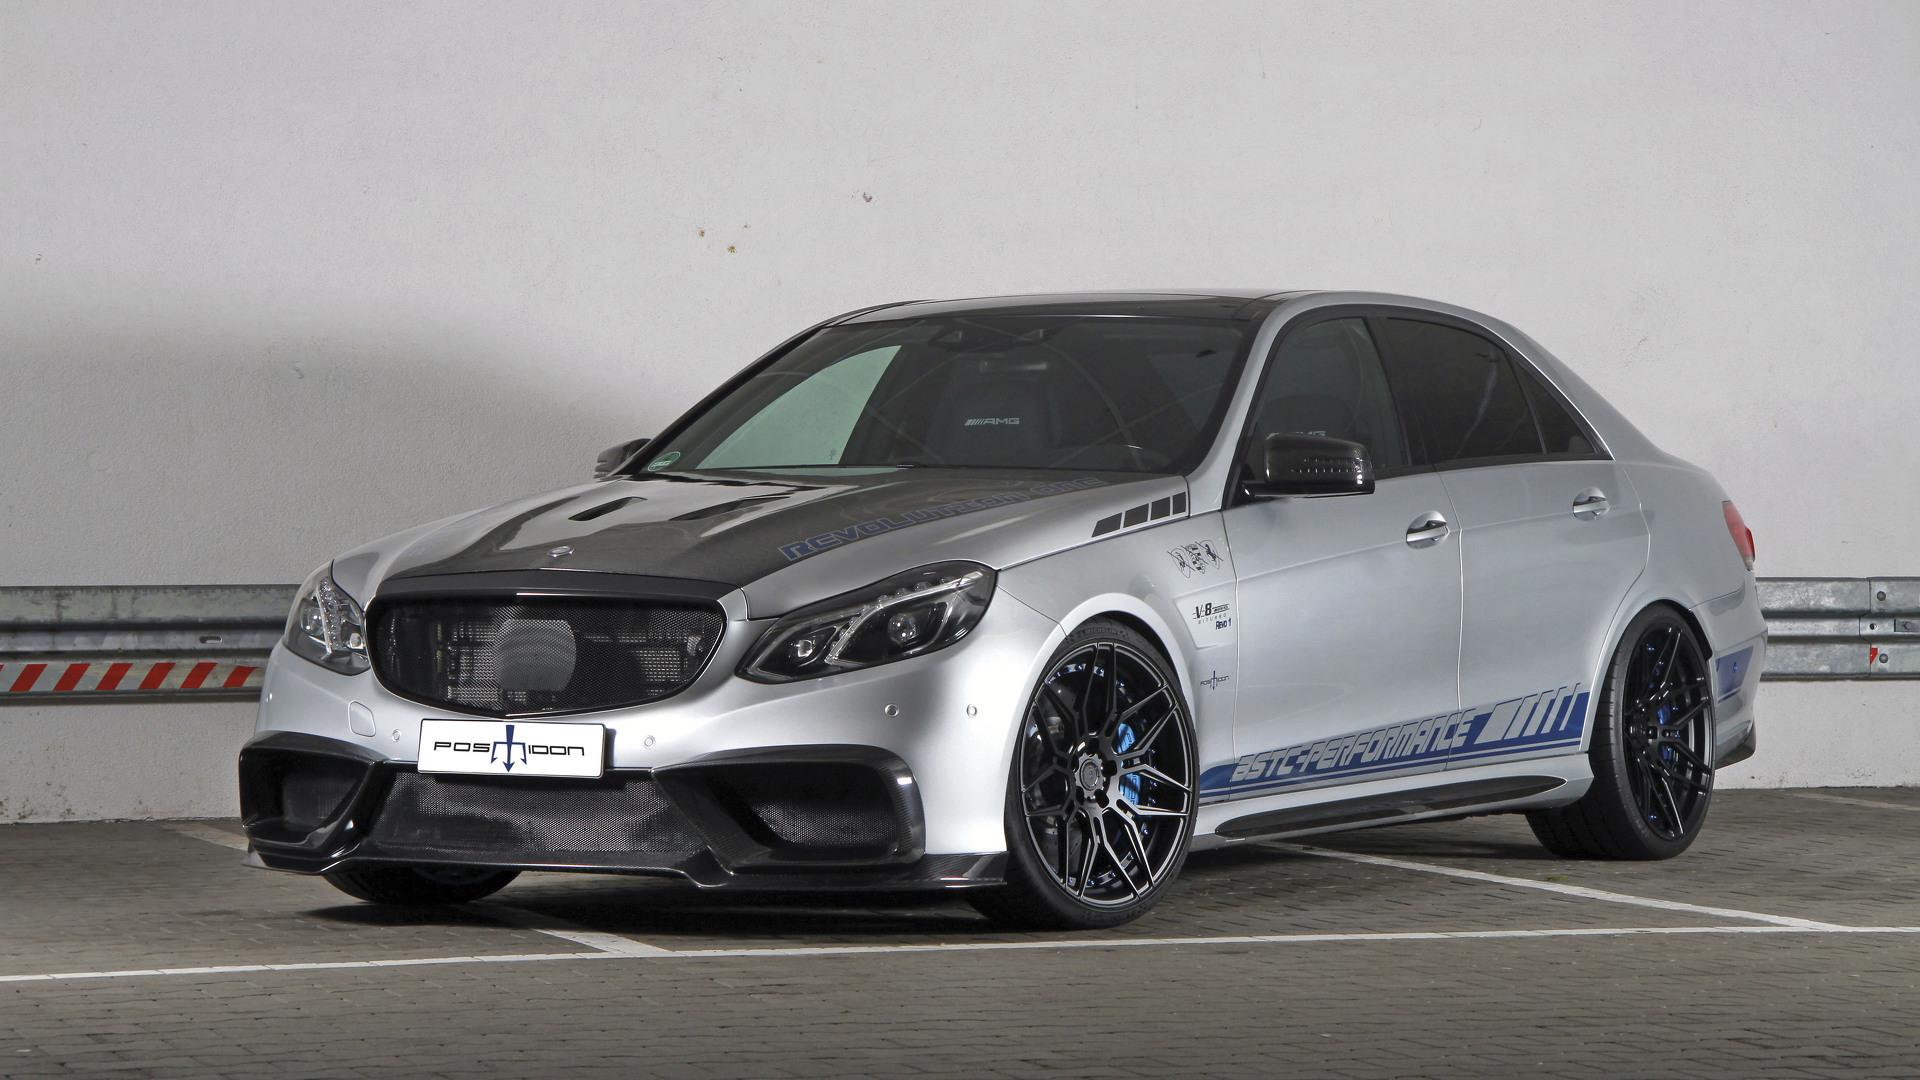 Chrysler Lamborghini >> Posaidon creates 1000hp Mercedes-AMG E 63 | PerformanceDrive